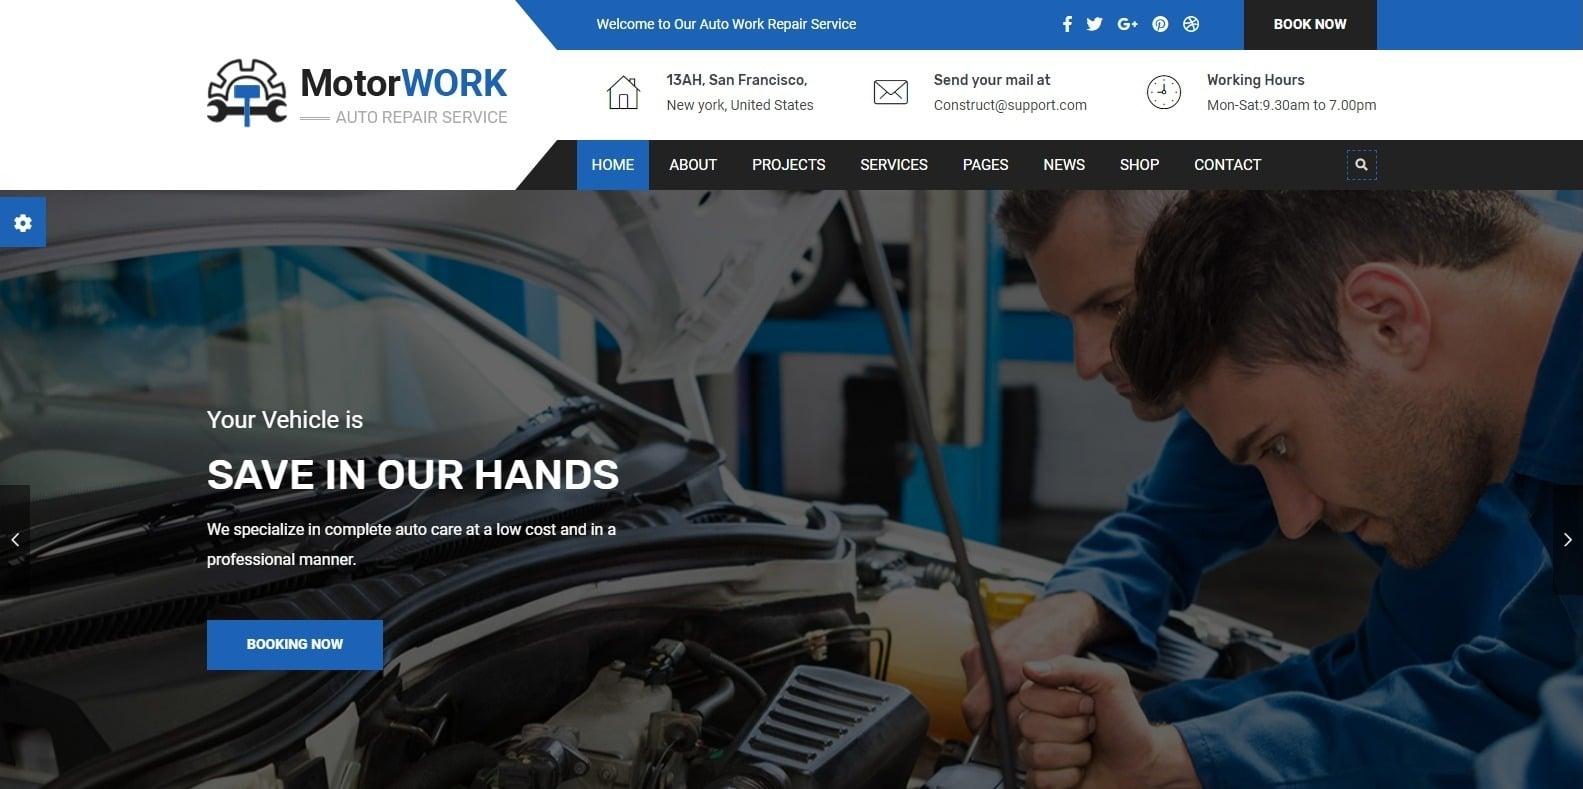 motorwork-automotive-website-template